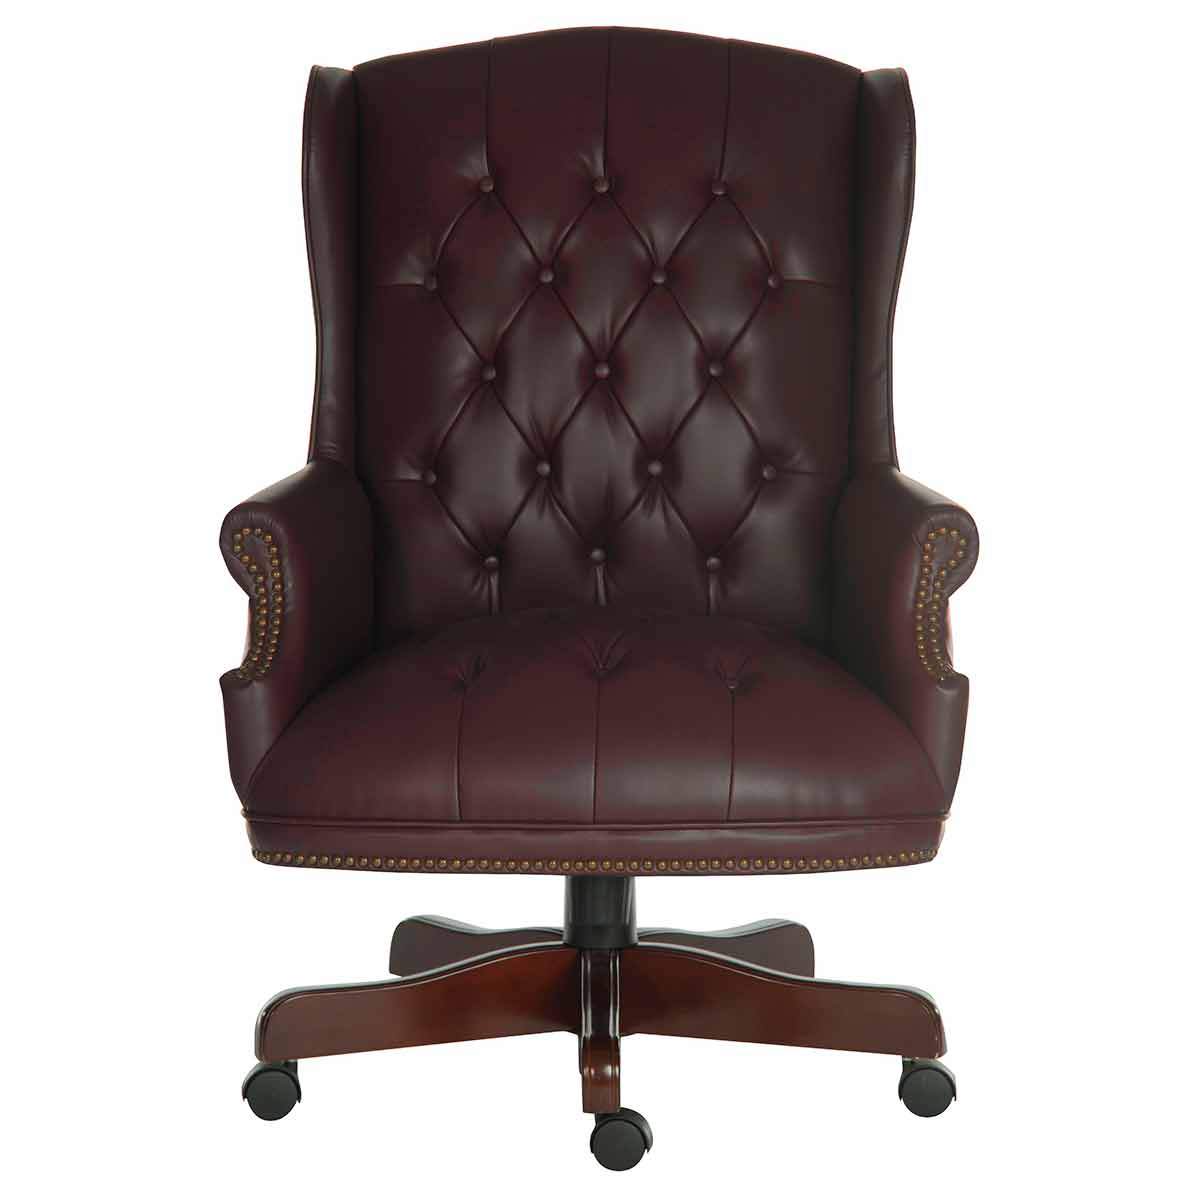 Brown Executive Chairs Office Chairs U0026 Seating Furniture U0026 Storage   Ryman